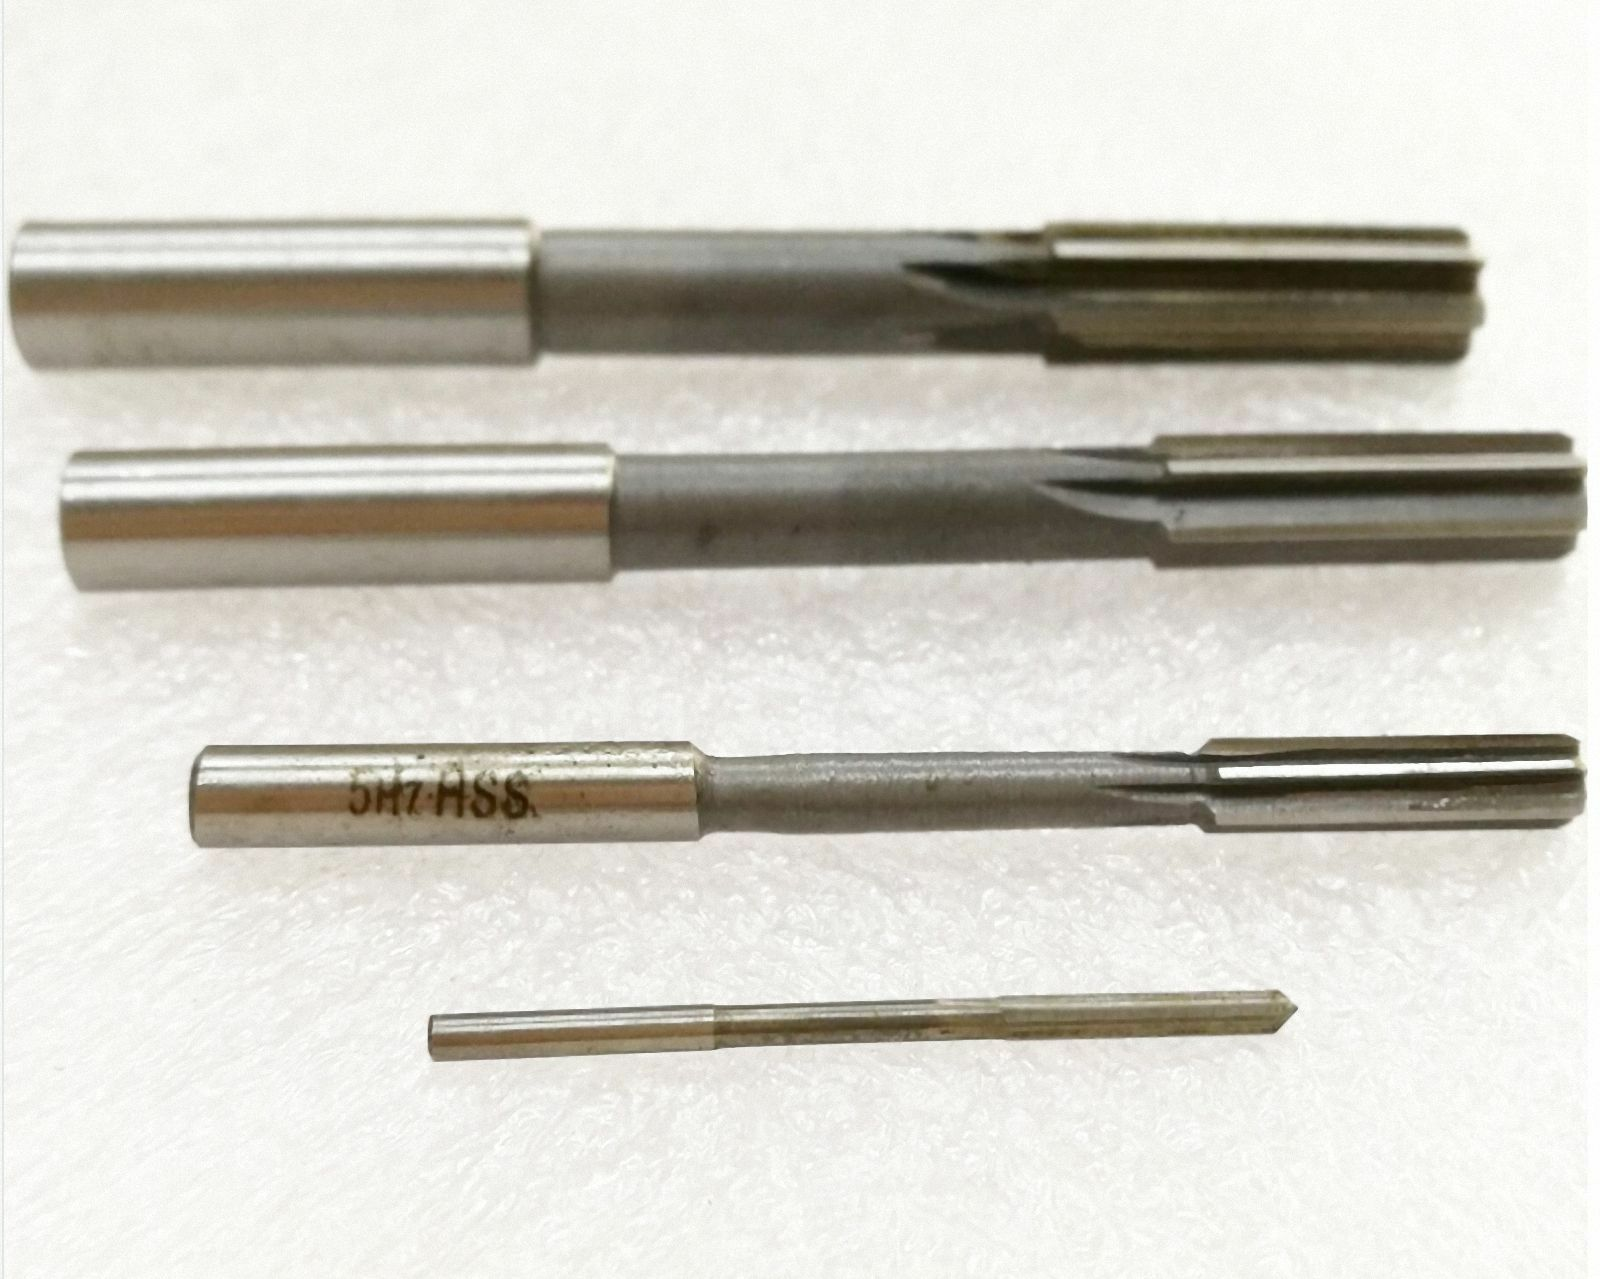 Select Größe 44.1mm to 50mm Machine HSS Straight Shank Shank Shank Milling Reamer fd5d81